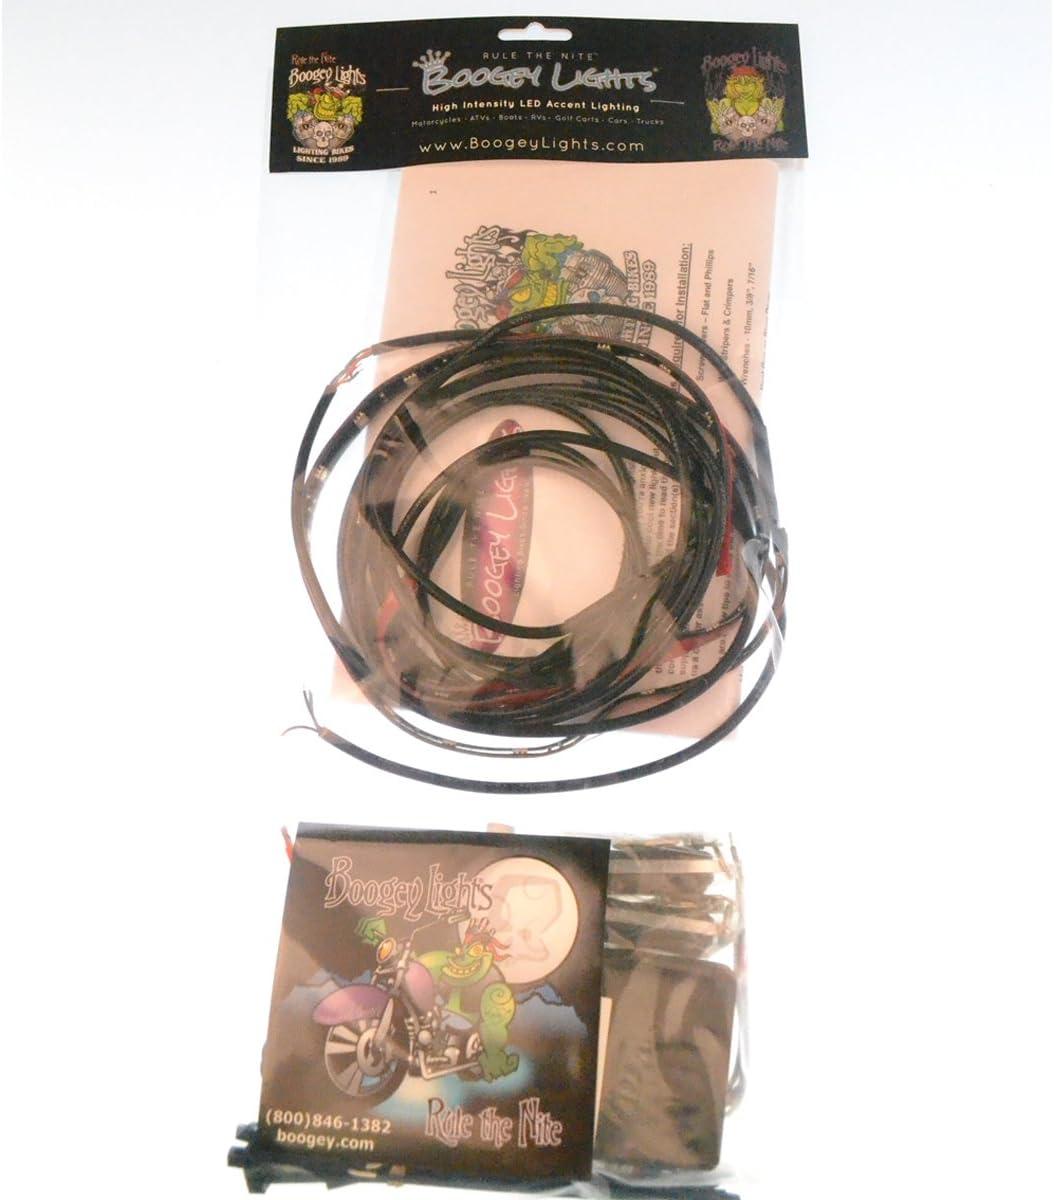 Boogey Lights KMV-VS-EK-MC-21L2 Value Series Multi-Color LED Engine Kit with Wireless RF Controller